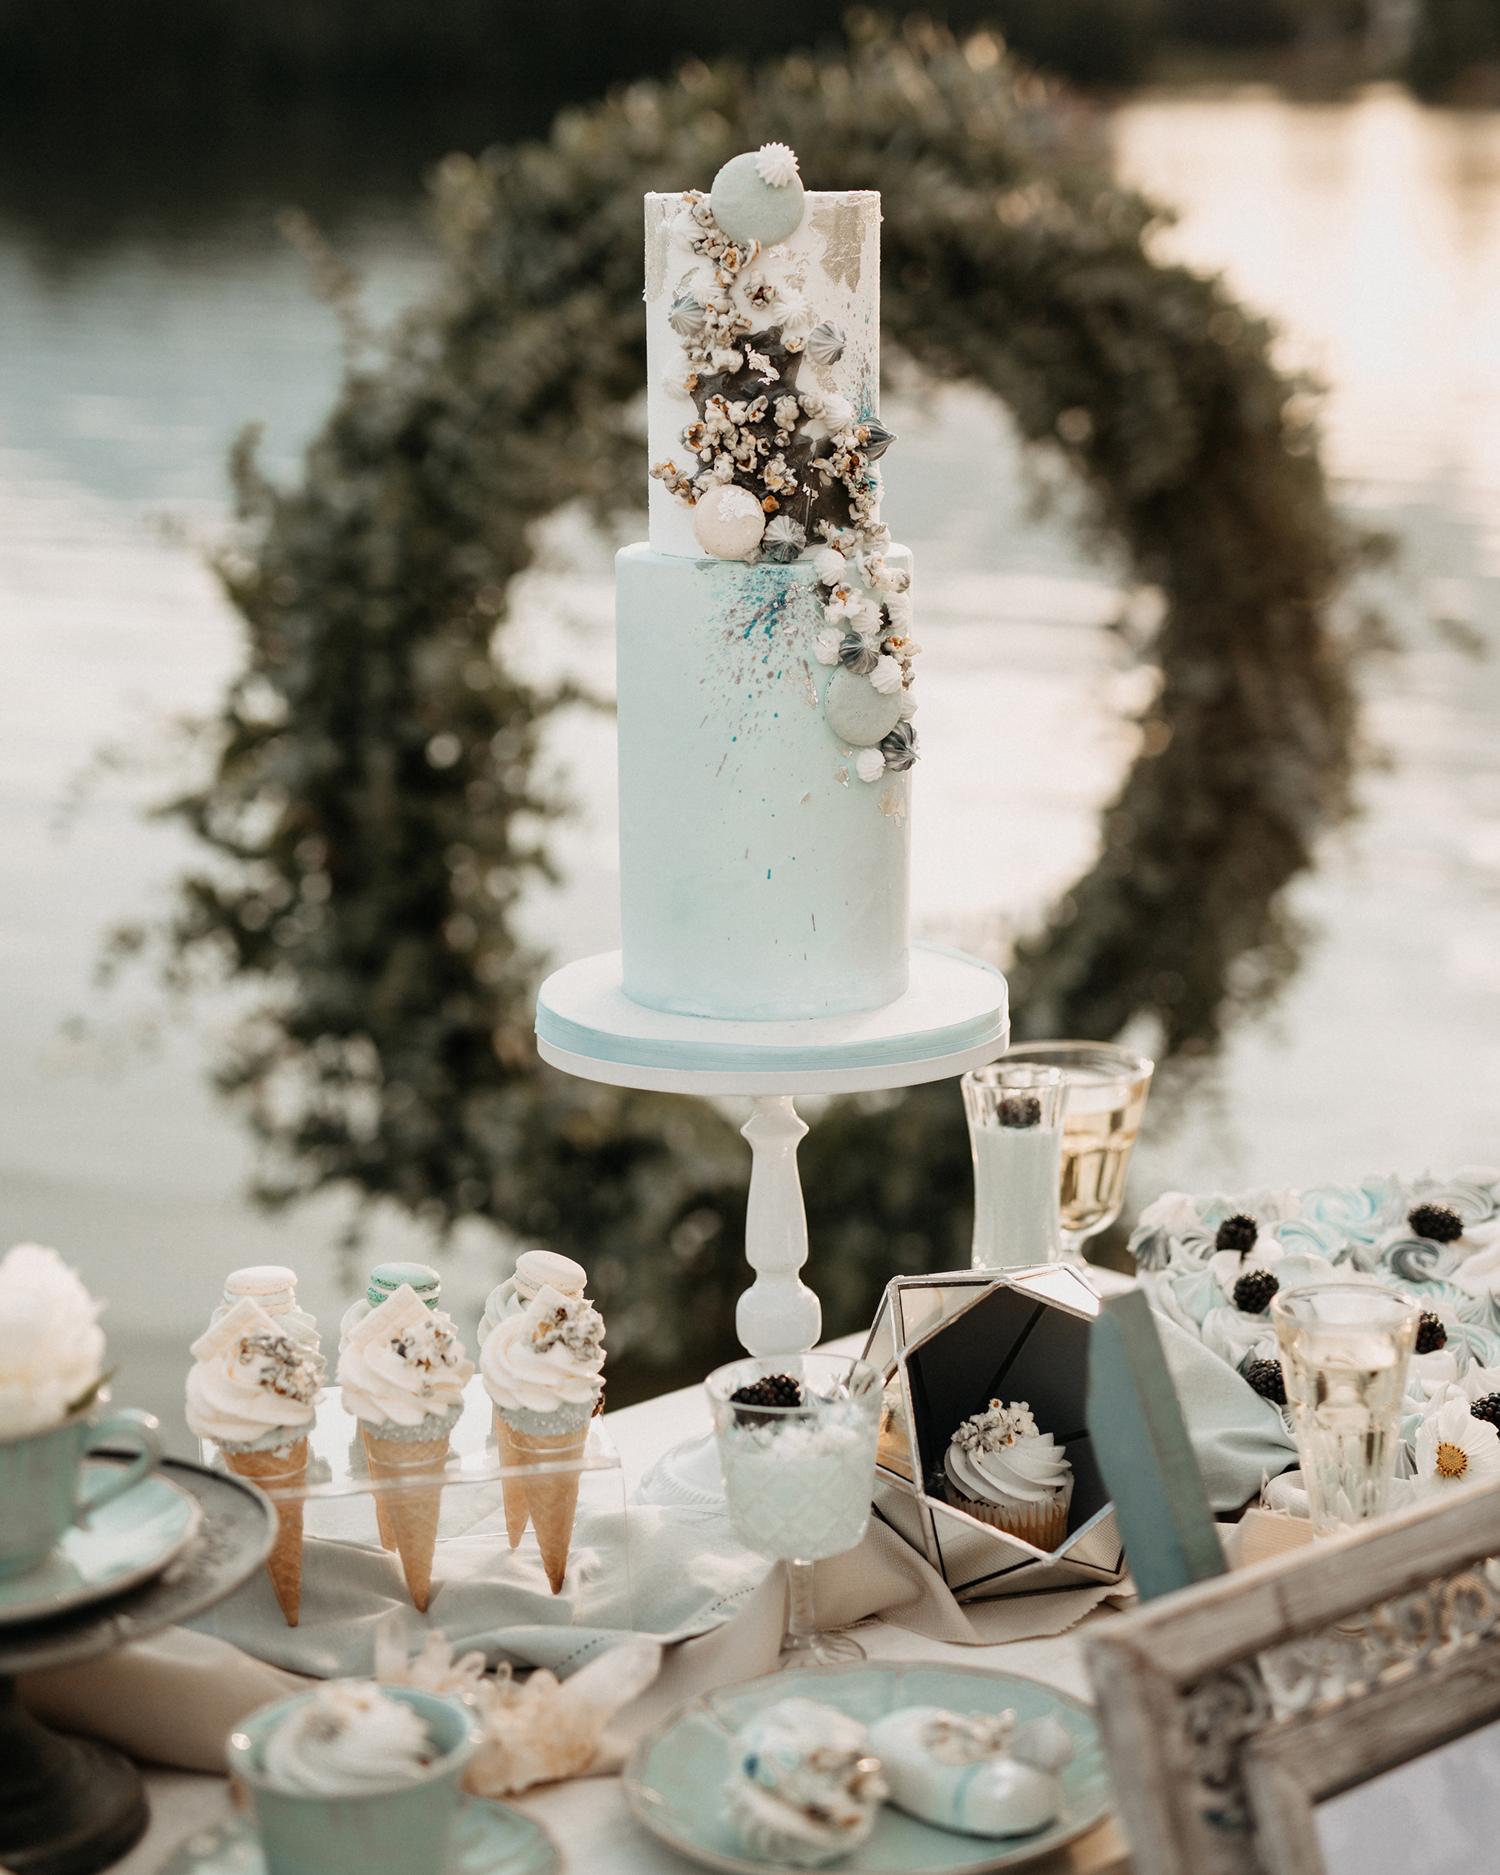 dessert table with ice cream cones